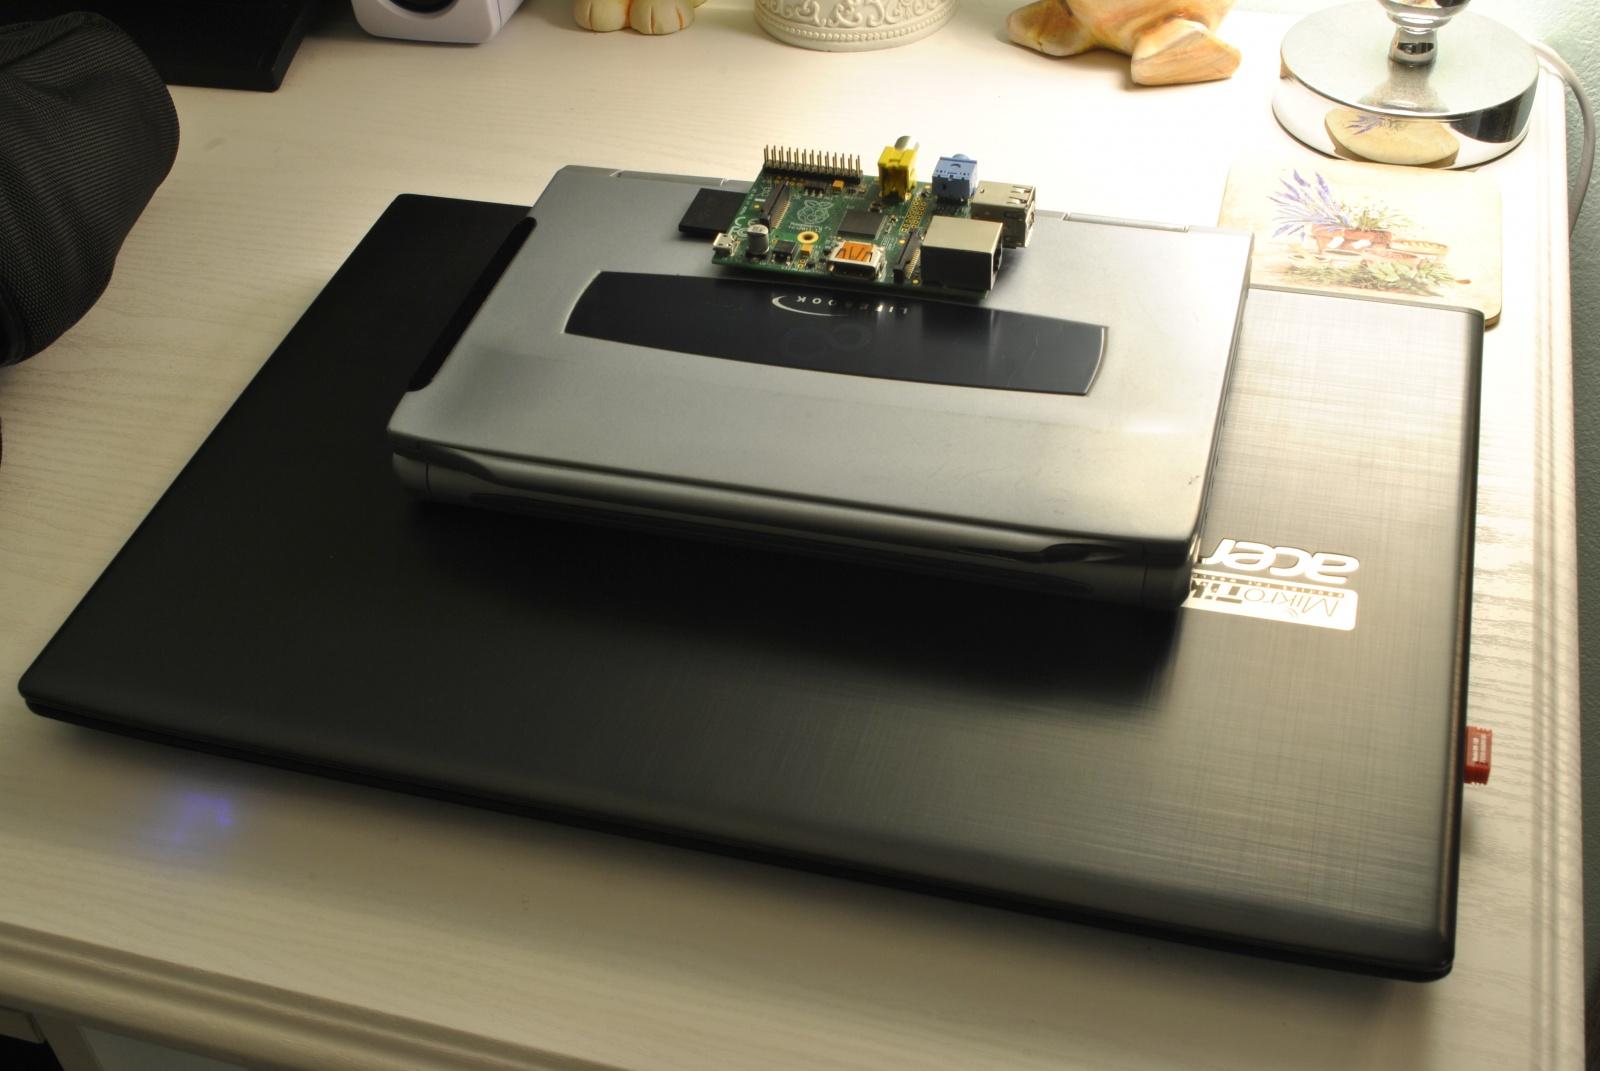 Ультрабук начала 2000-х – обзор Fujitsu LifeBook P-1032 - 3